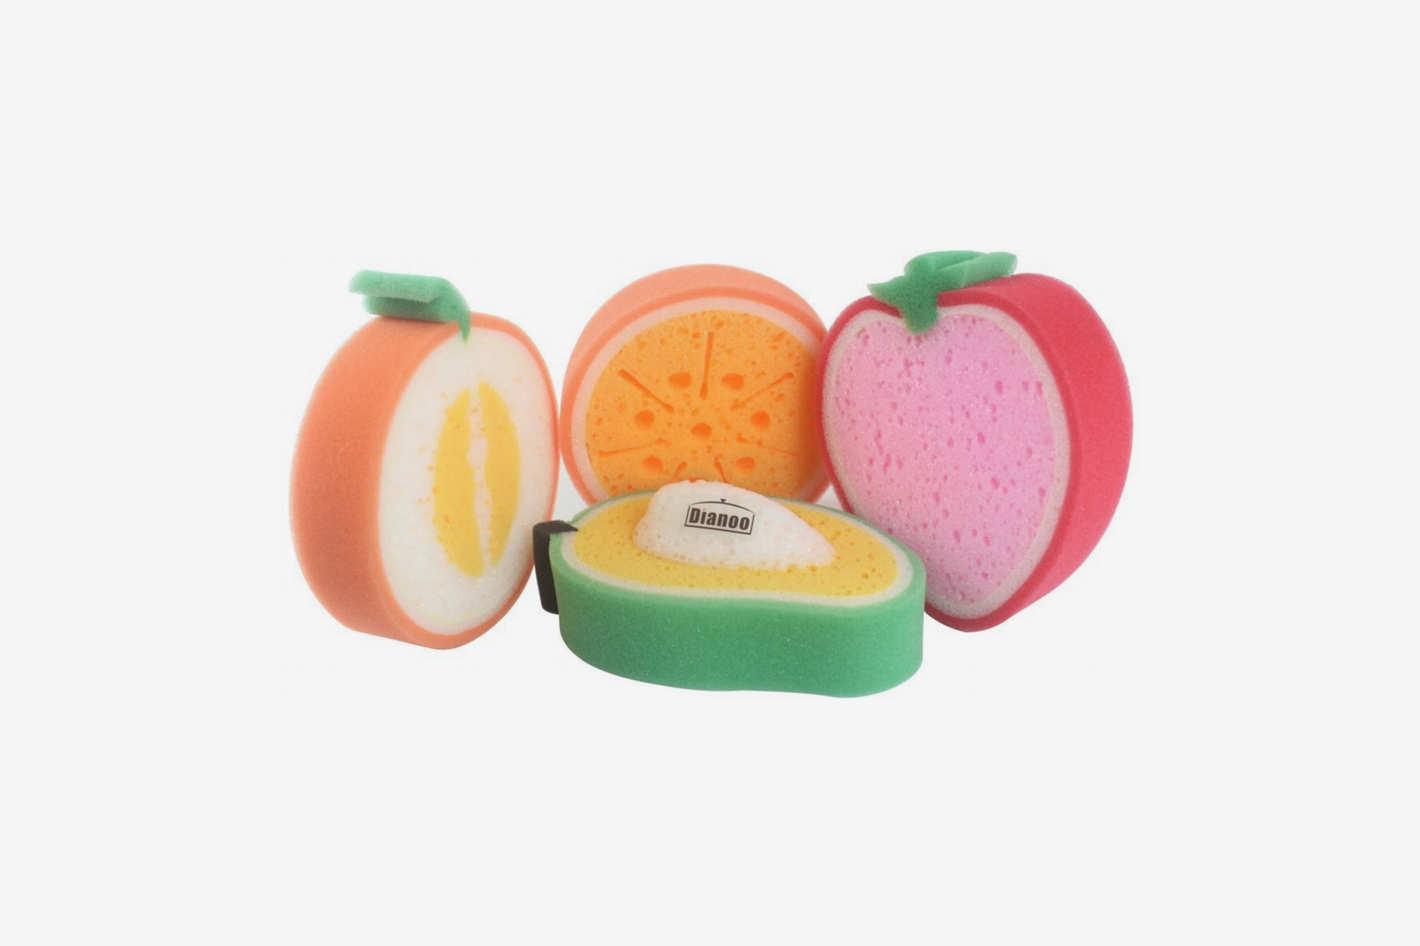 Dianoo Fruit Style Dish Sponge